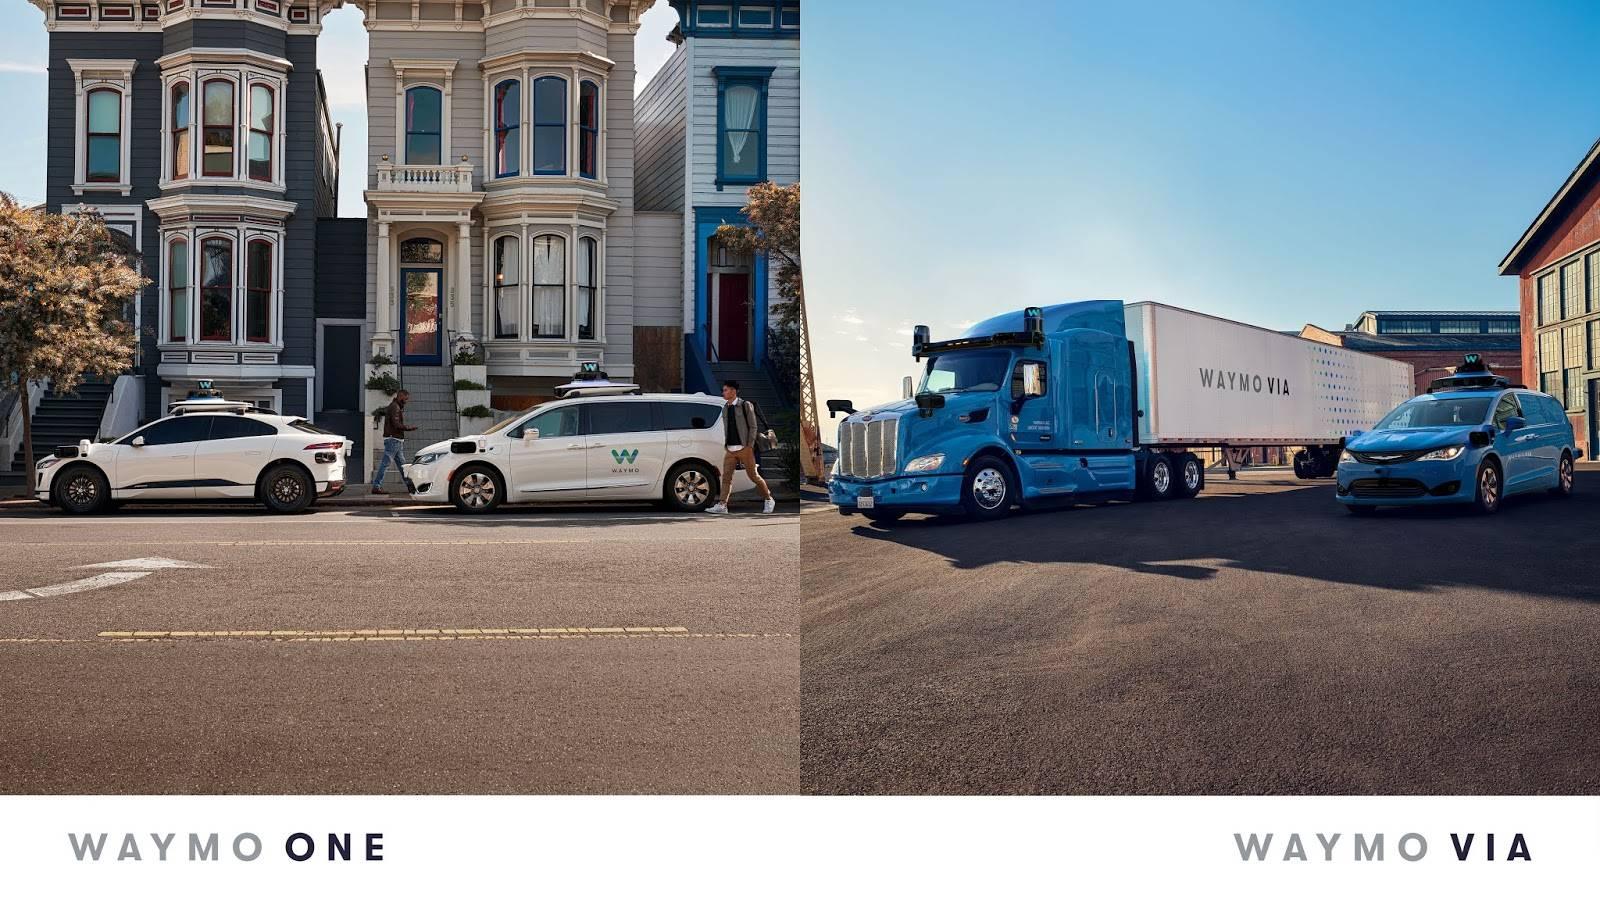 Waymo两大场景:自动驾驶 货运配送